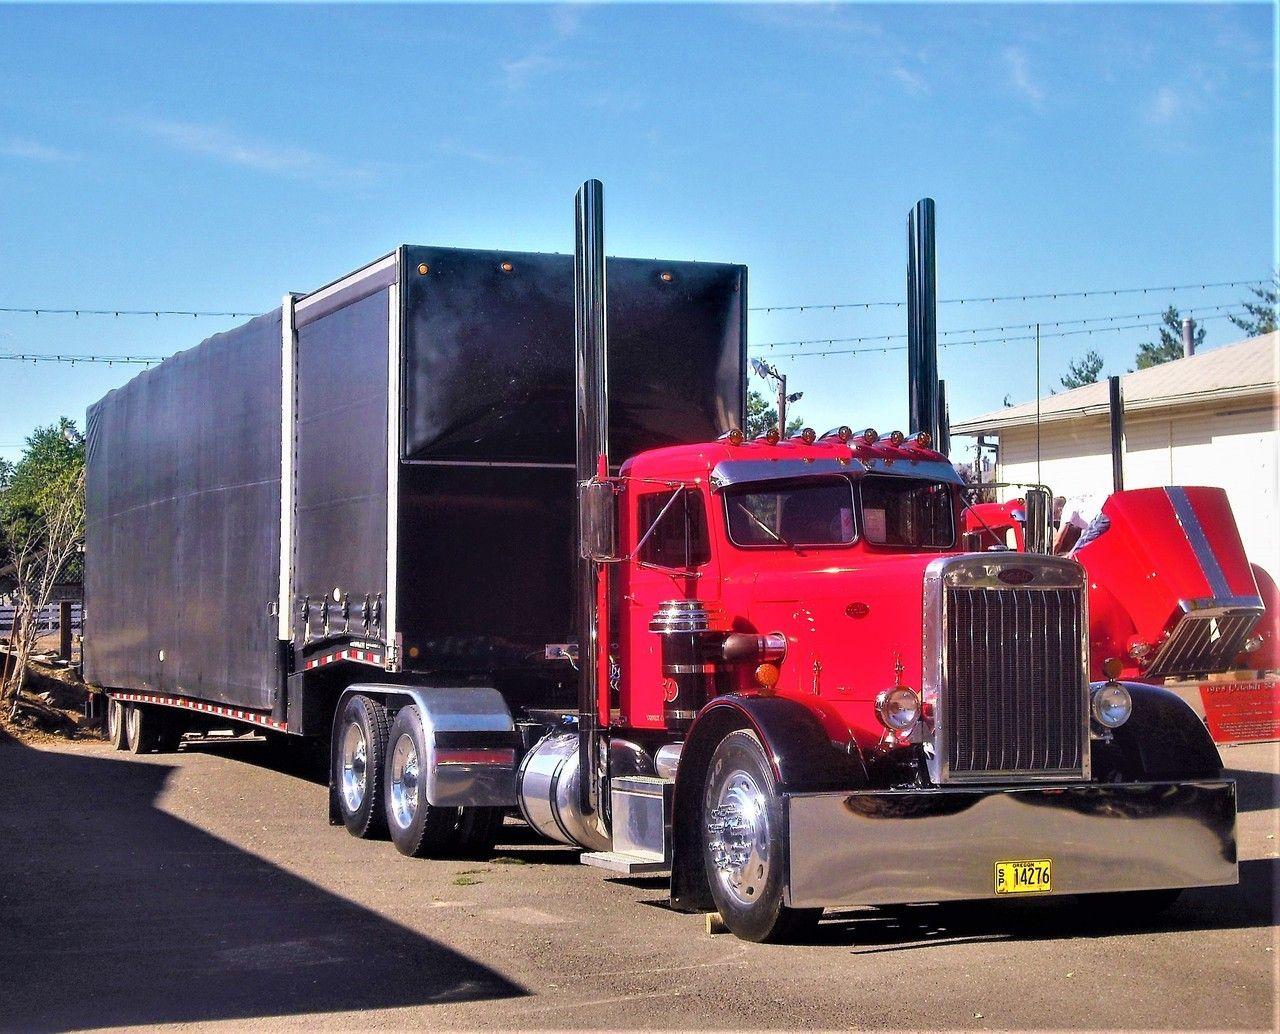 Millions Of Semi Trucks With Images Big Trucks Big Rig Trucks